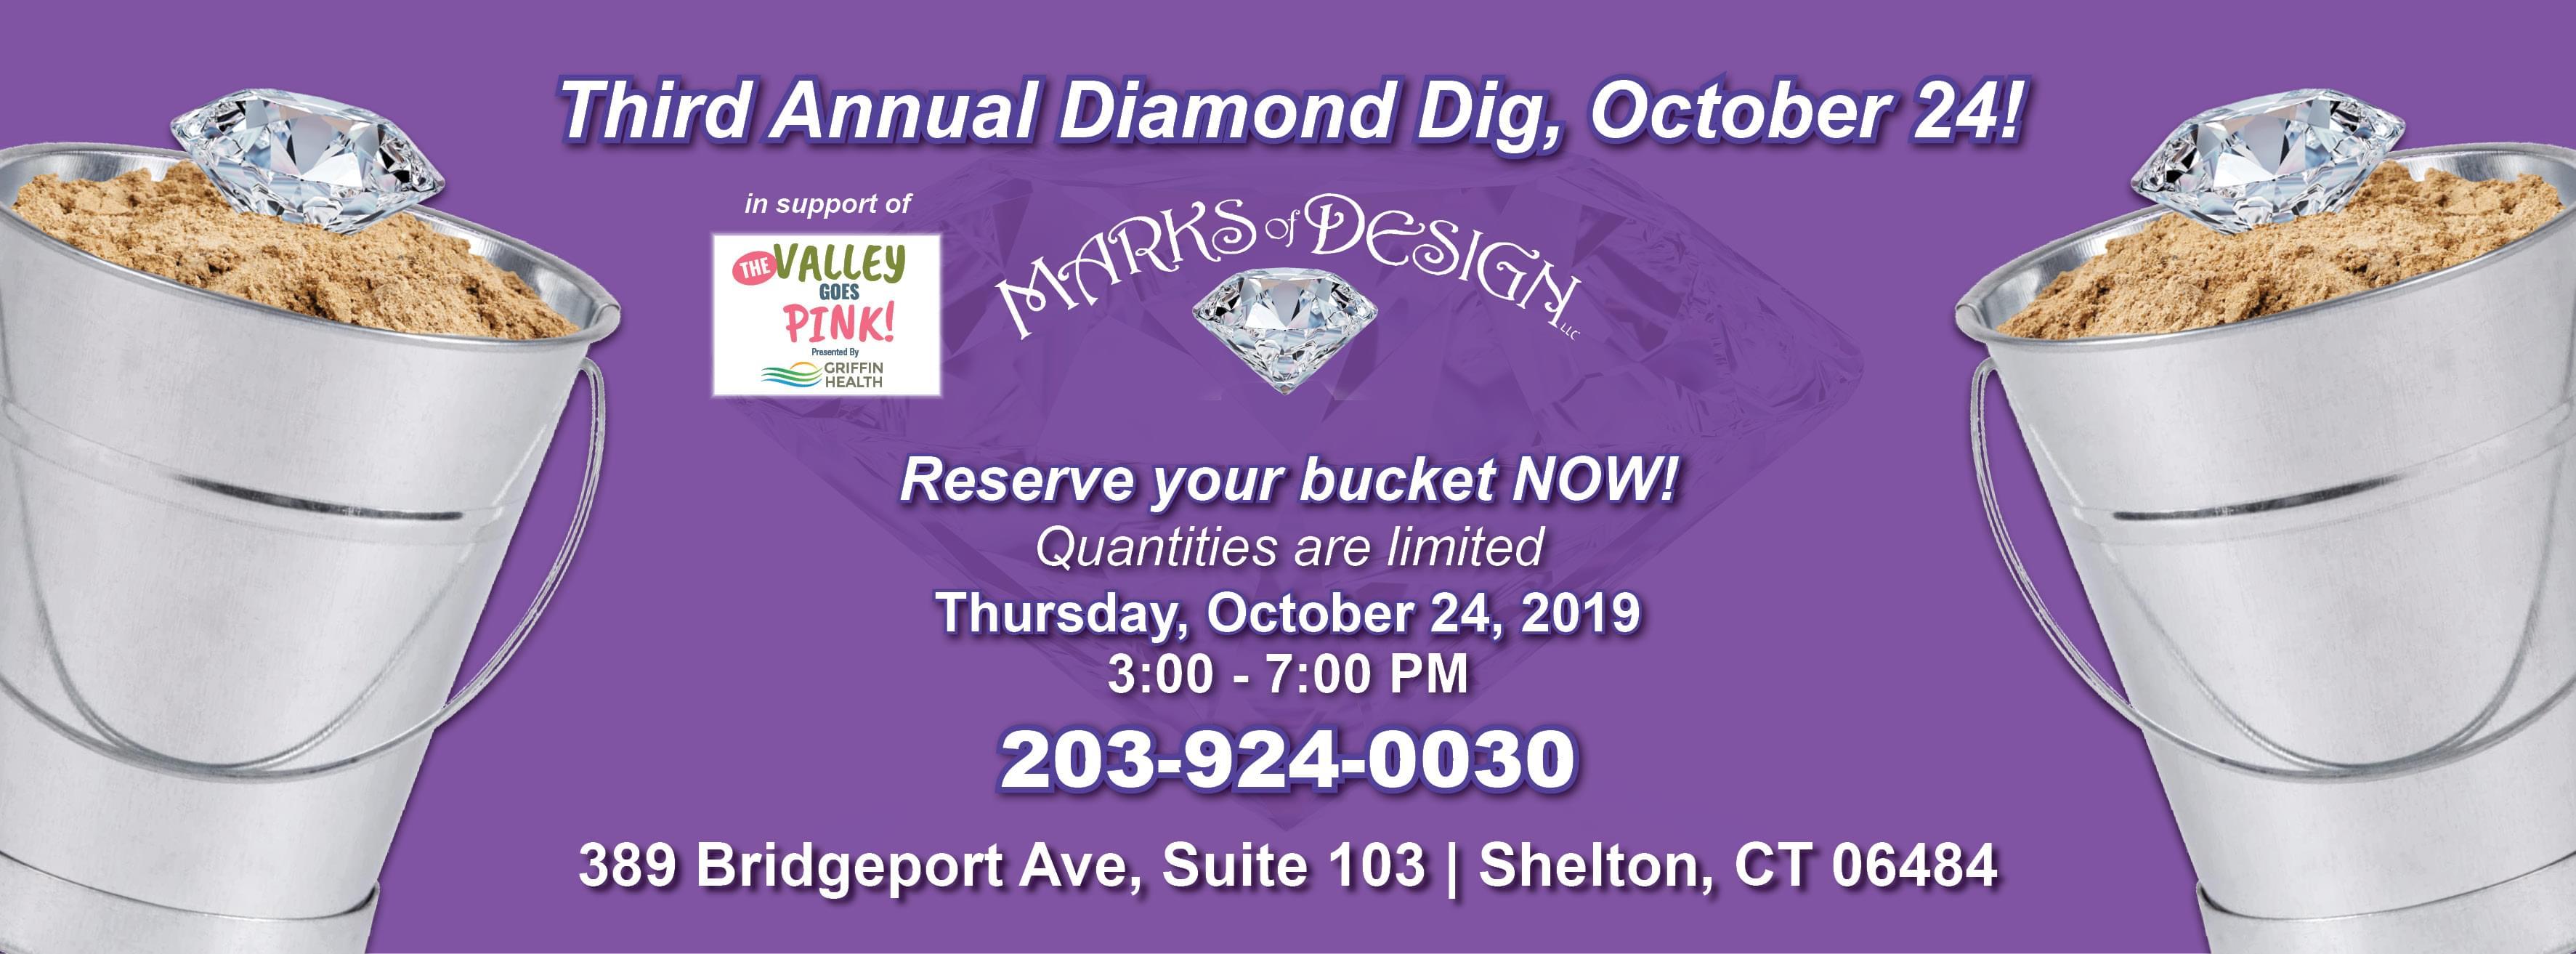 Marks of Design Diamond Dig Logo